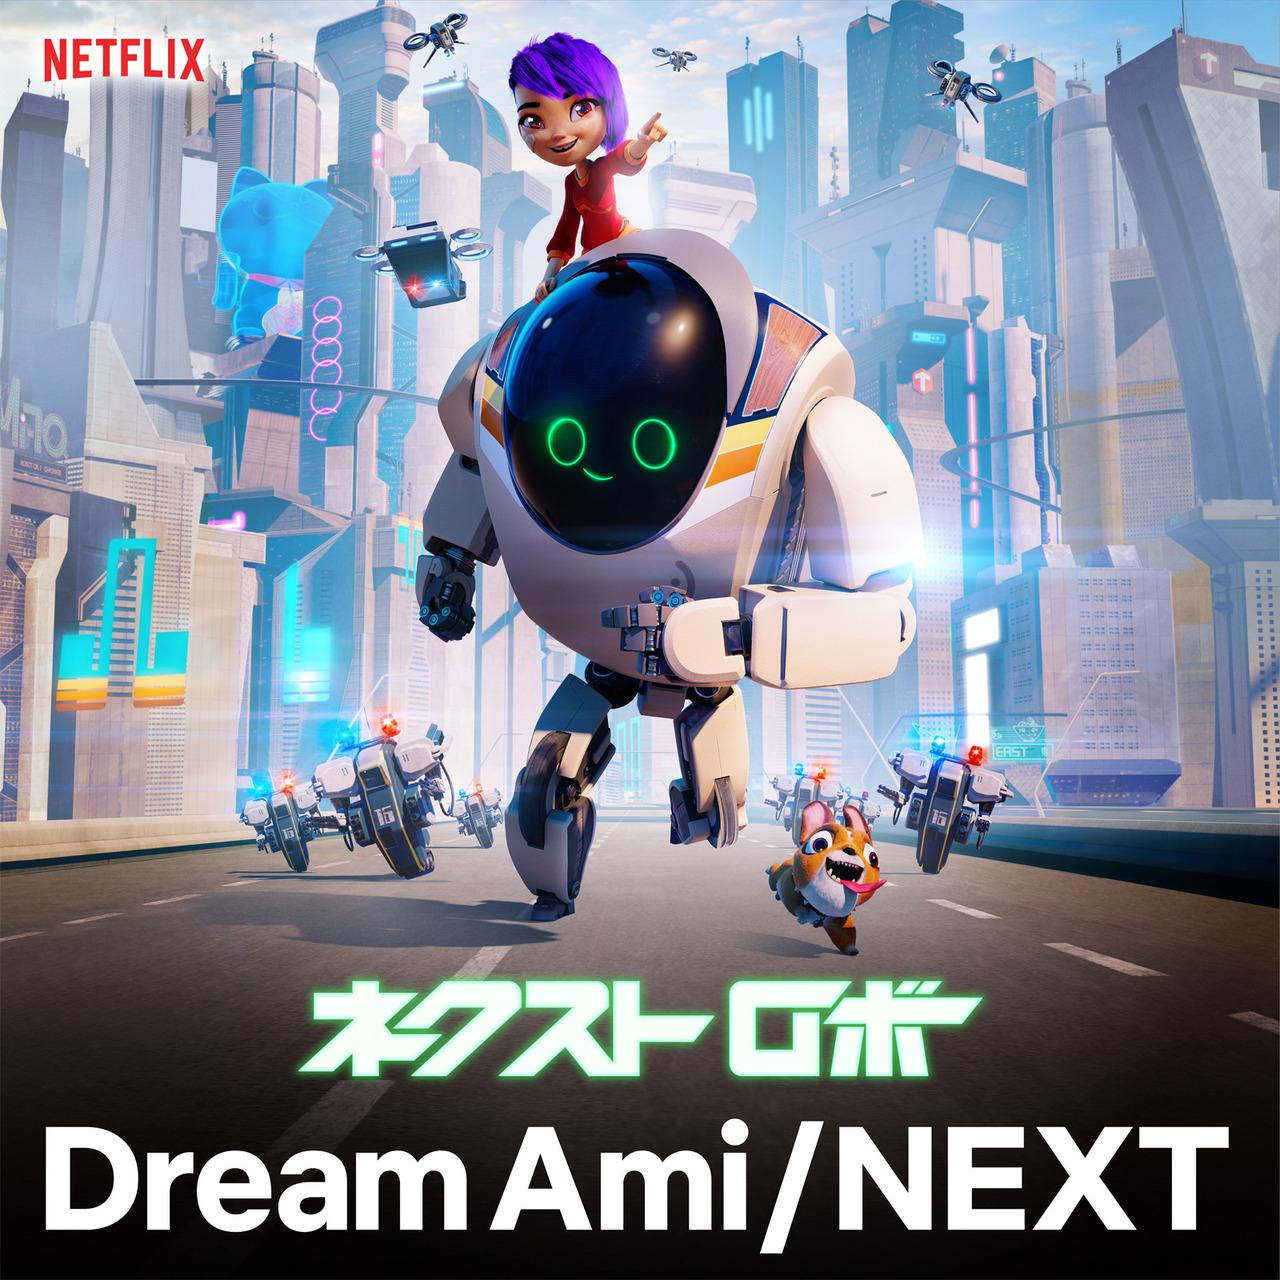 【dream Ami】netflix S Original Movie Quot Next Gen Quot Released